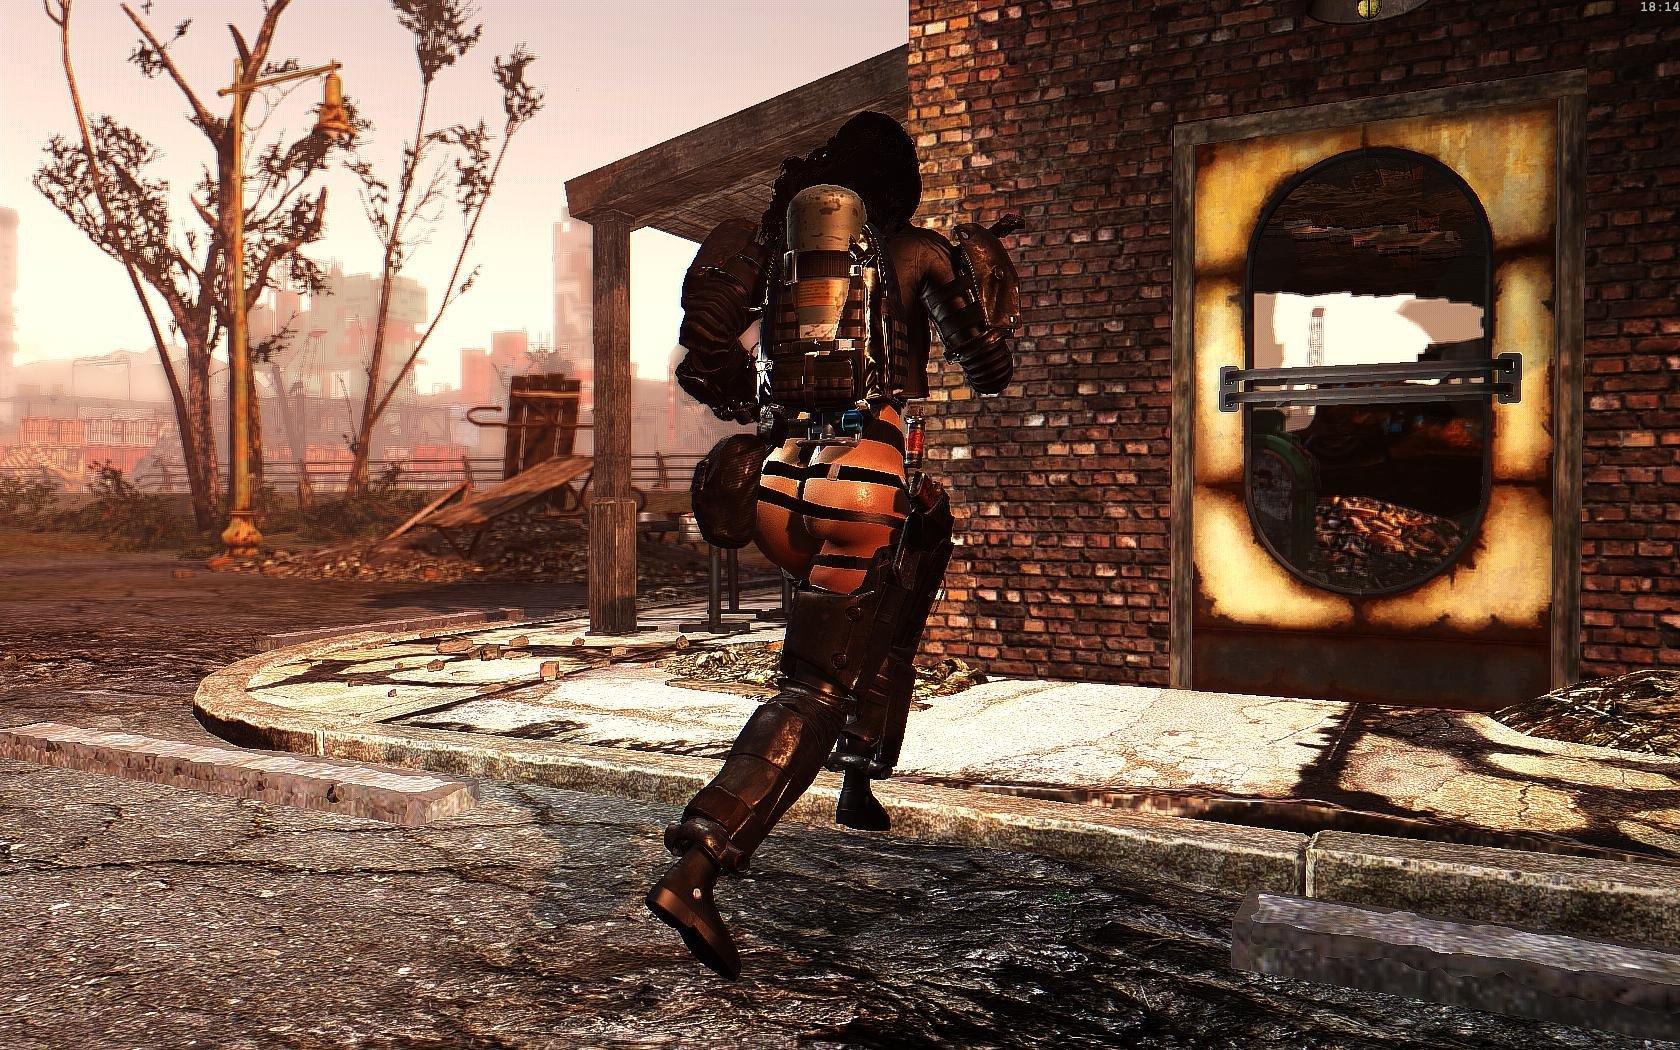 Fallout4 2018-10-27 18-14-23-55.jpg